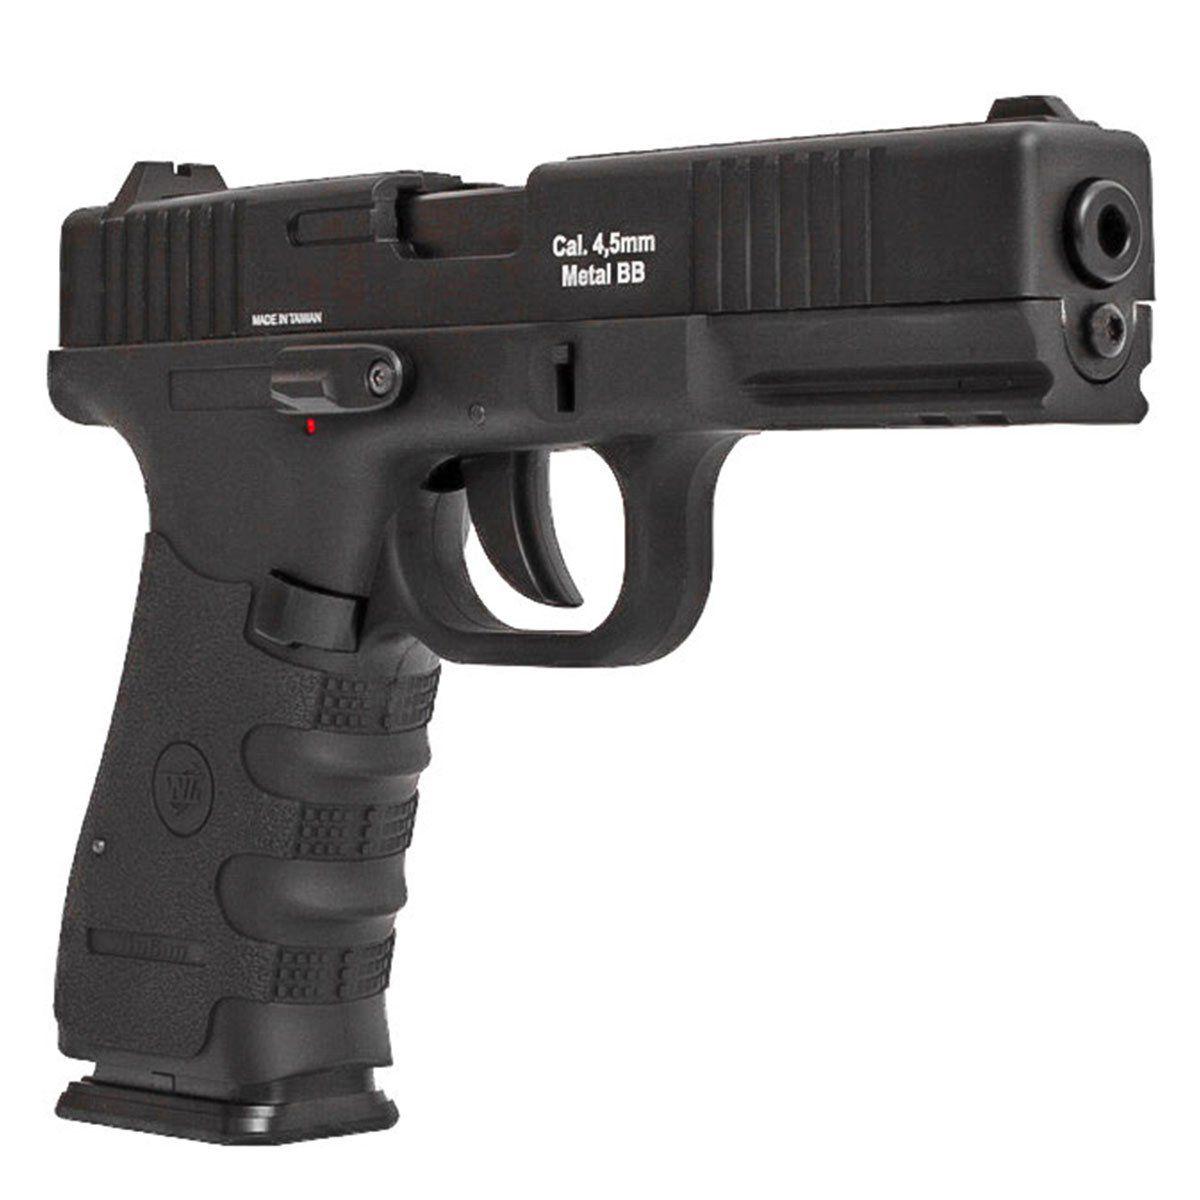 Pistola de Pressão Wingun W119 Slide Metal CO2 4,5mm